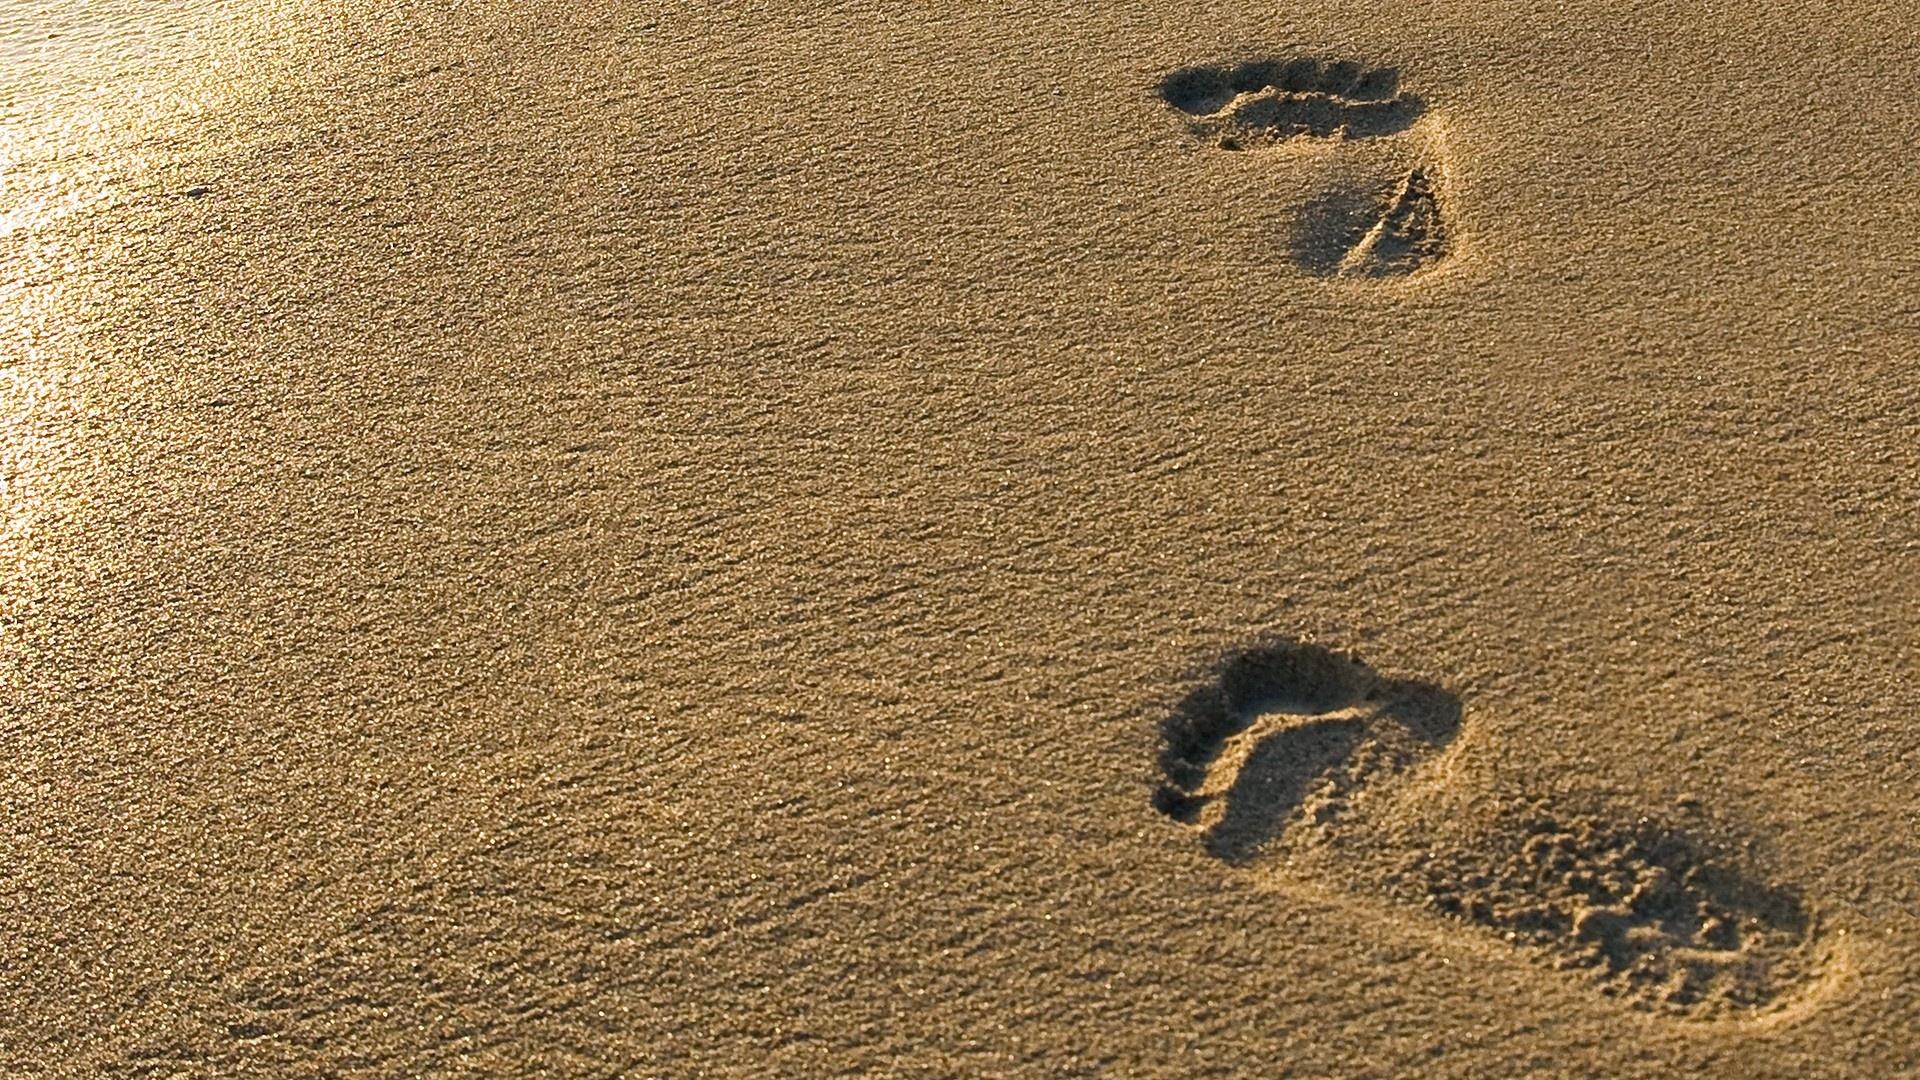 Footprints Wallpaper 1920x1080